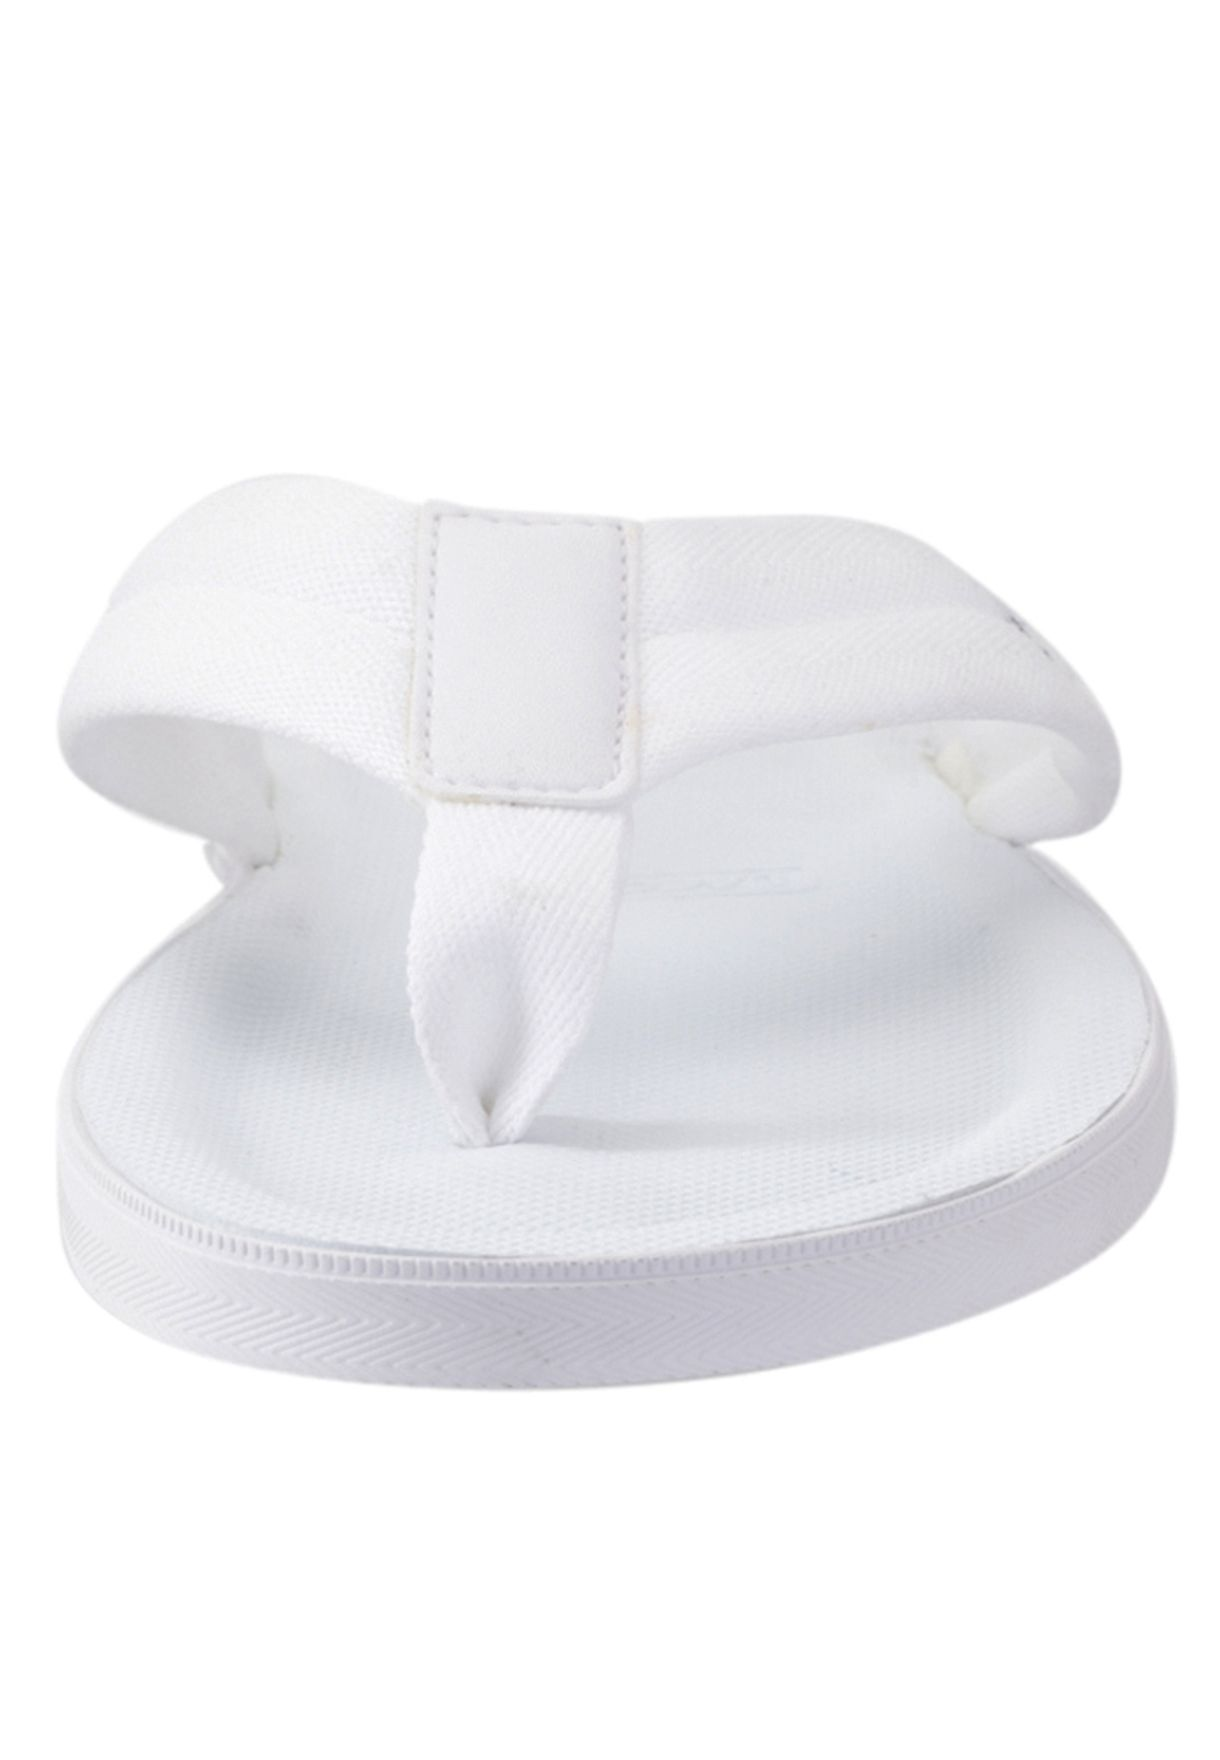 4ae8be7cfc78 Shop Lacoste white Casual Flipflops 25SPM4017-21G for Men in Bahrain ...